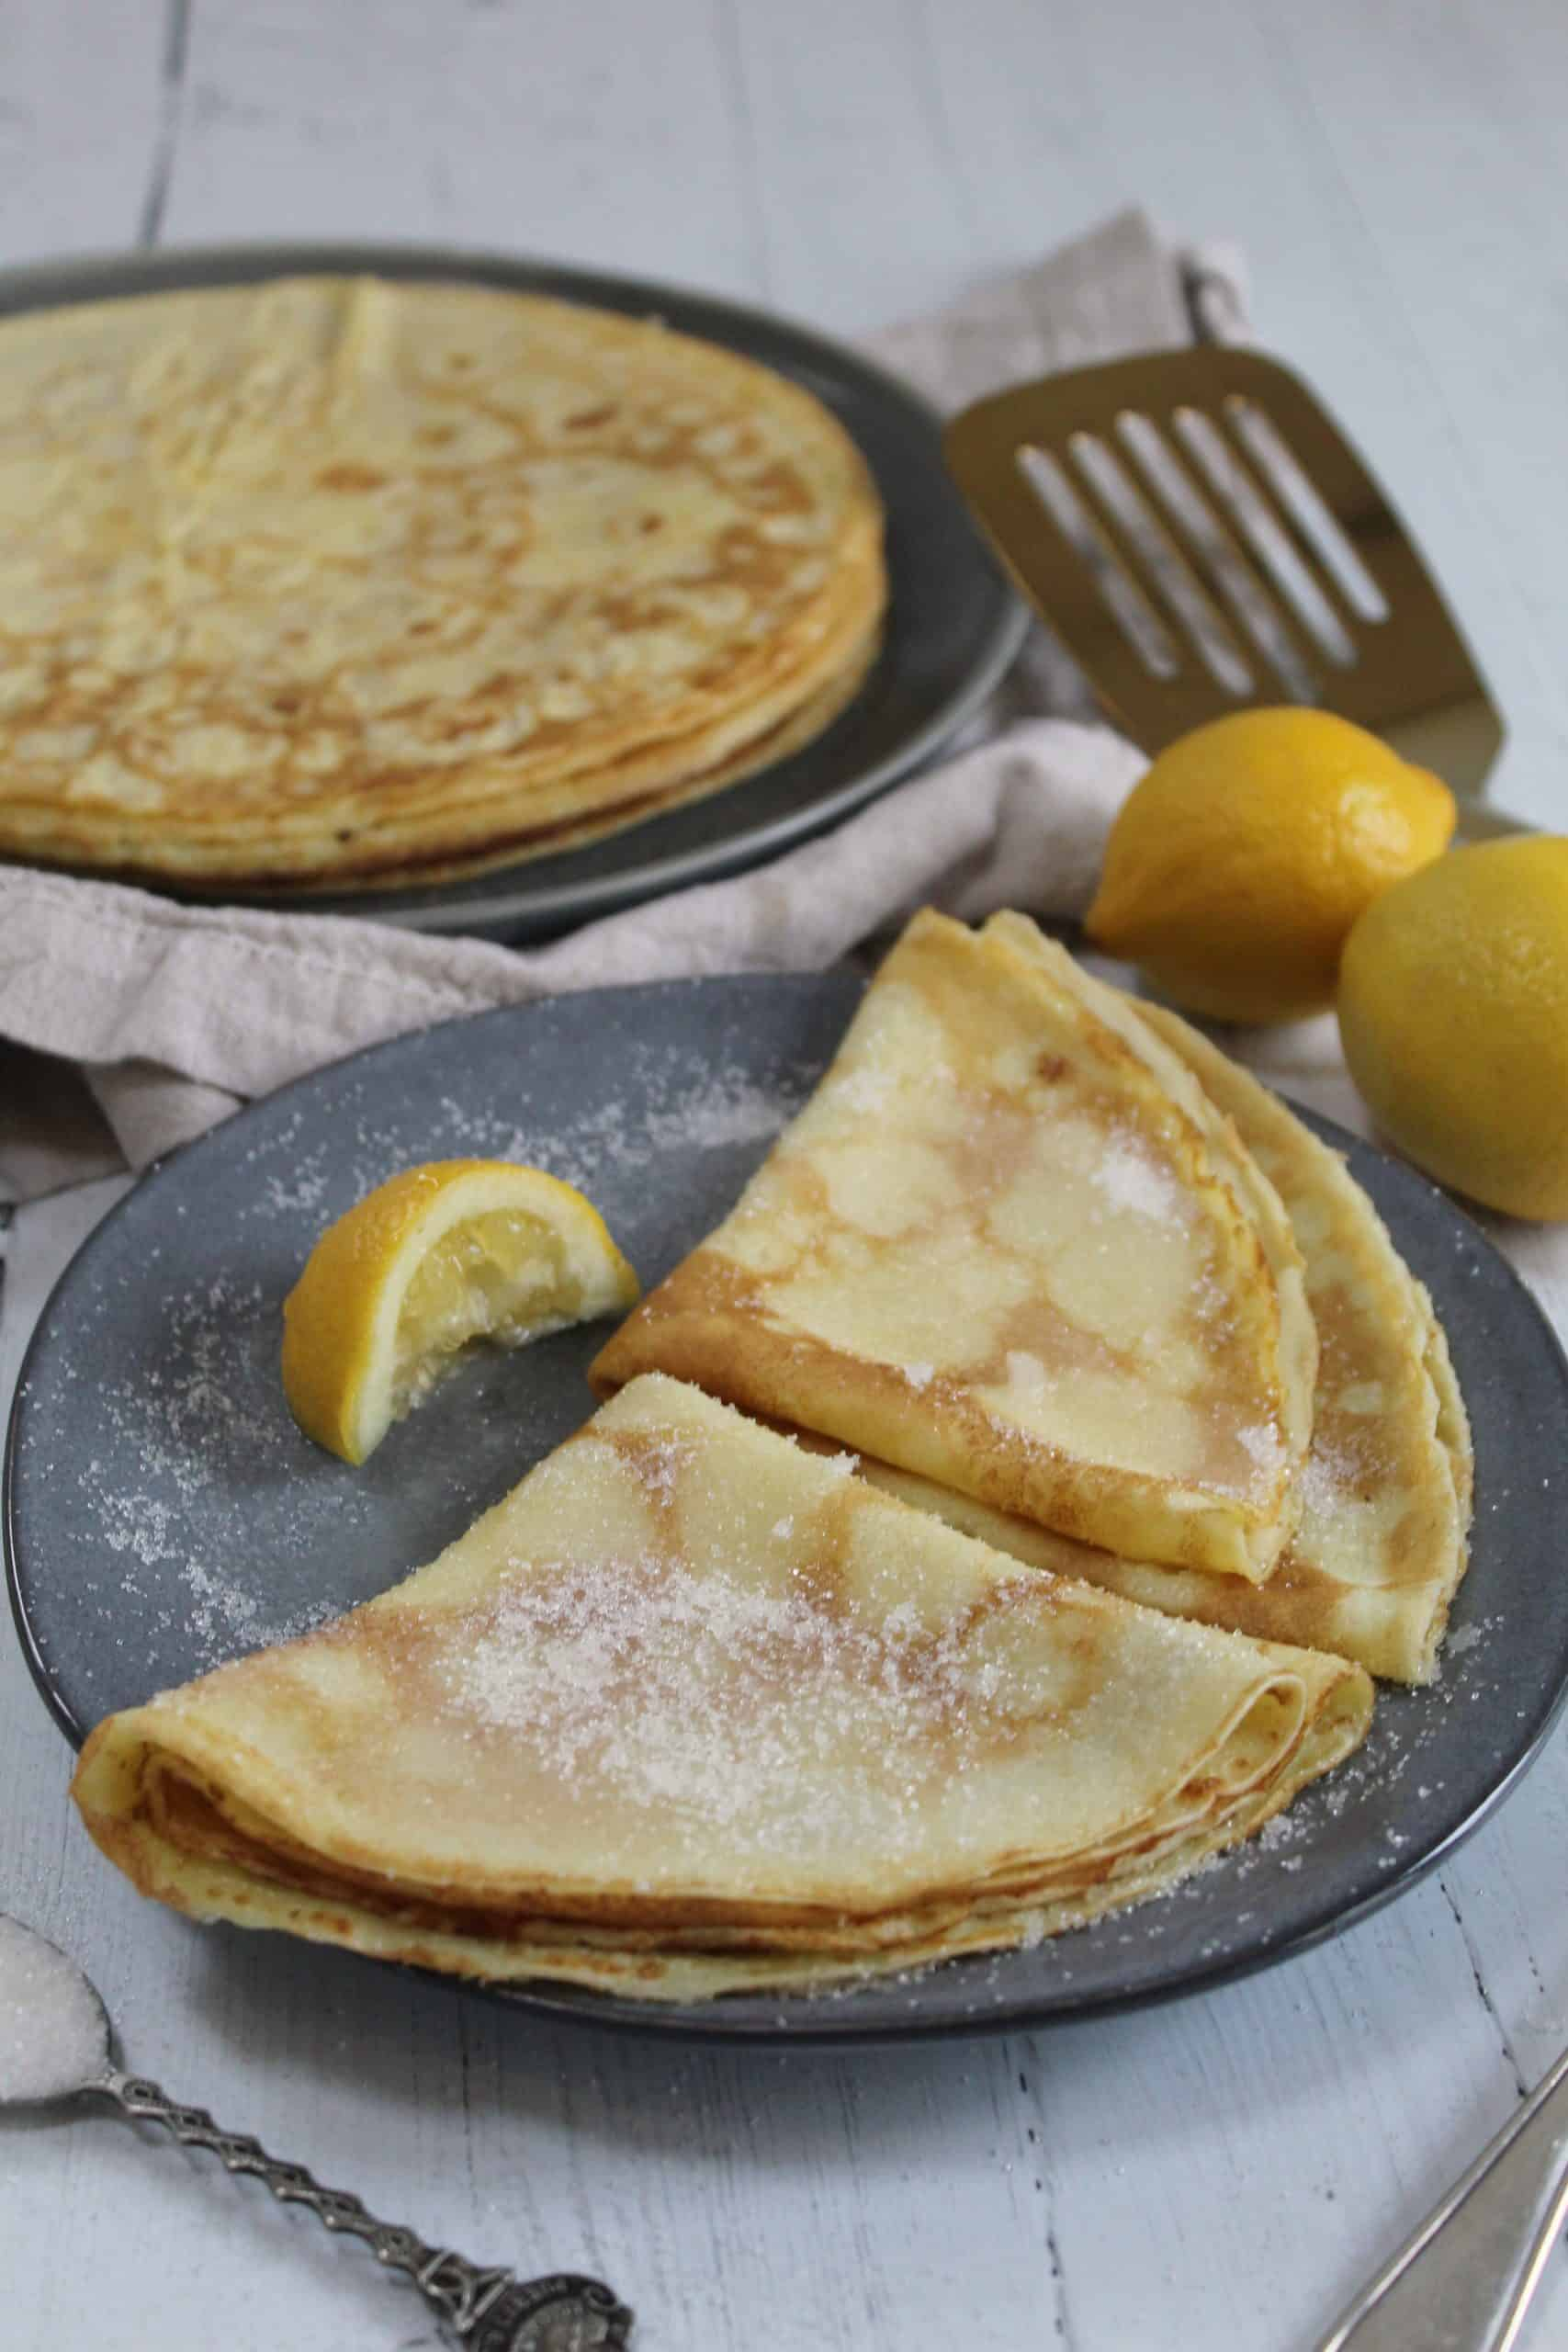 gluten free pancake recipe easy crepe style 10